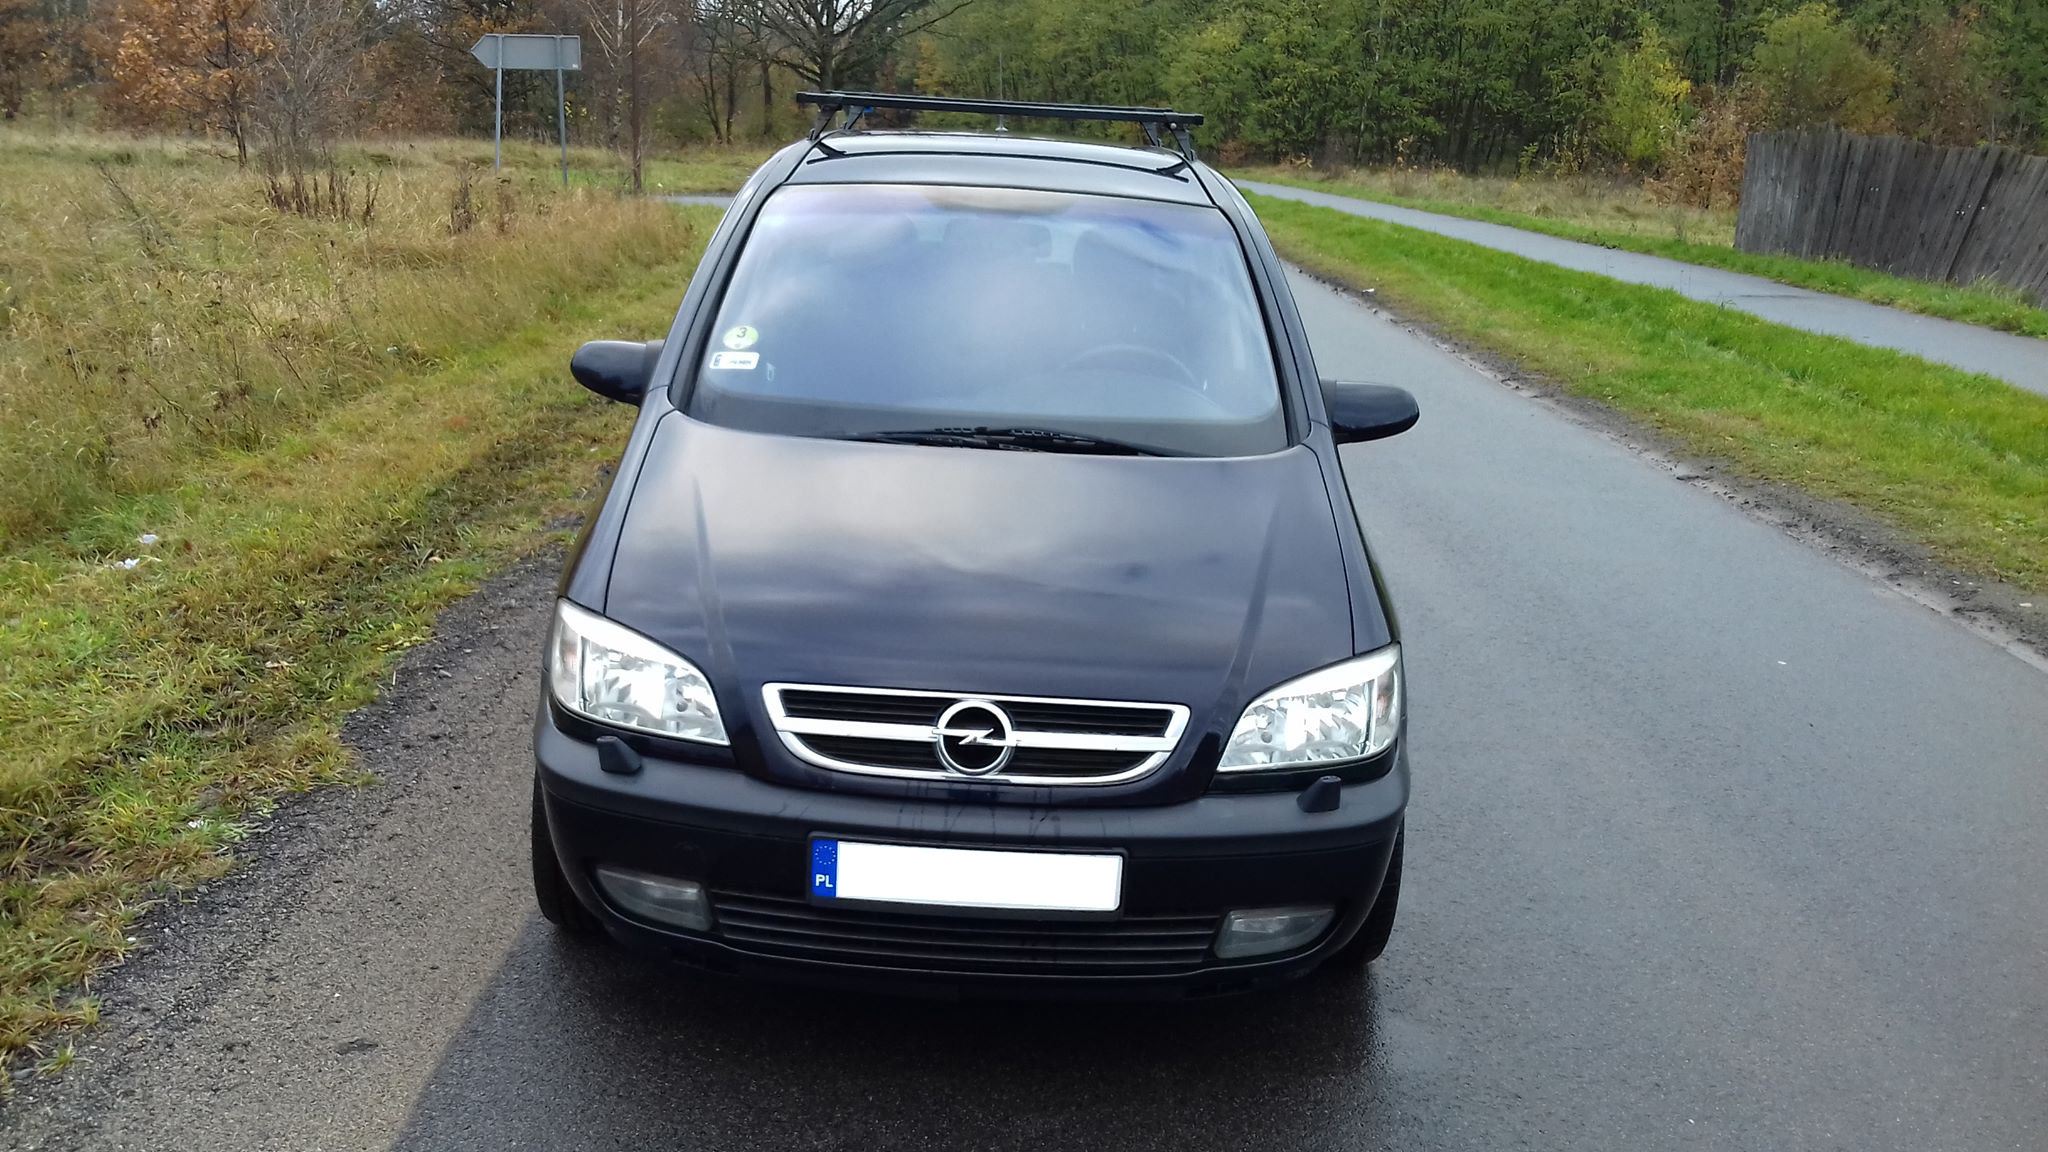 Opel Zafira 2.0 DTI Alufelgi! 7 osób! Climatronic!